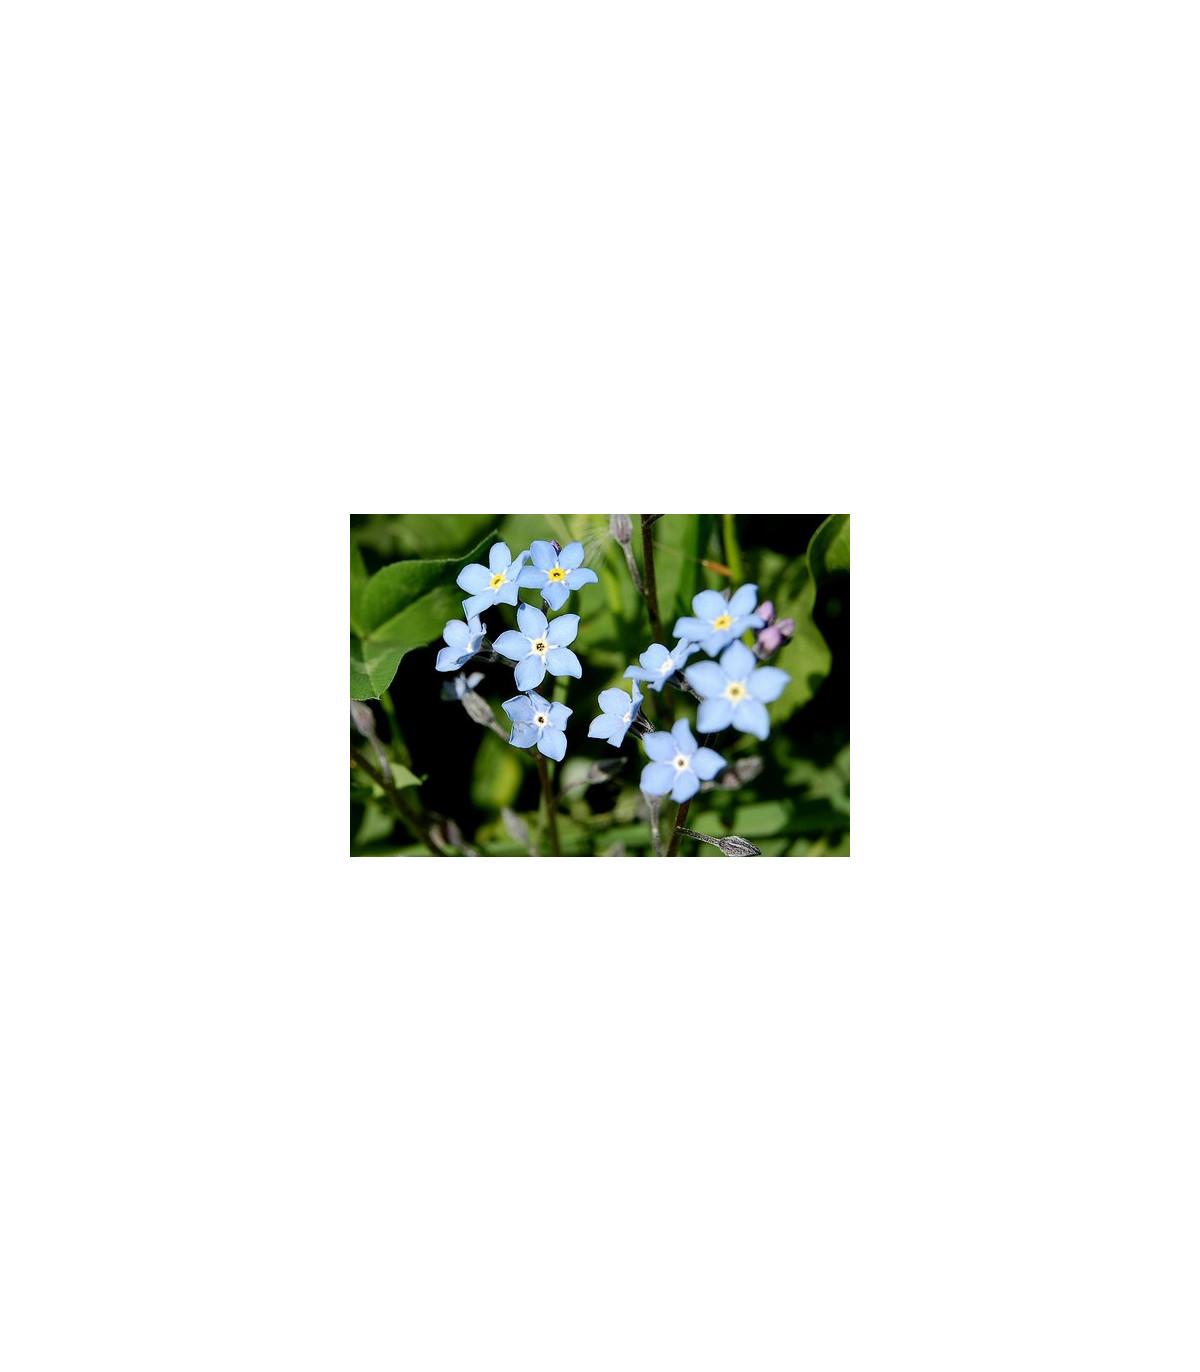 Pomněnka alpinská - semena Pomněnky - 180 ks - Myosotis alpestris